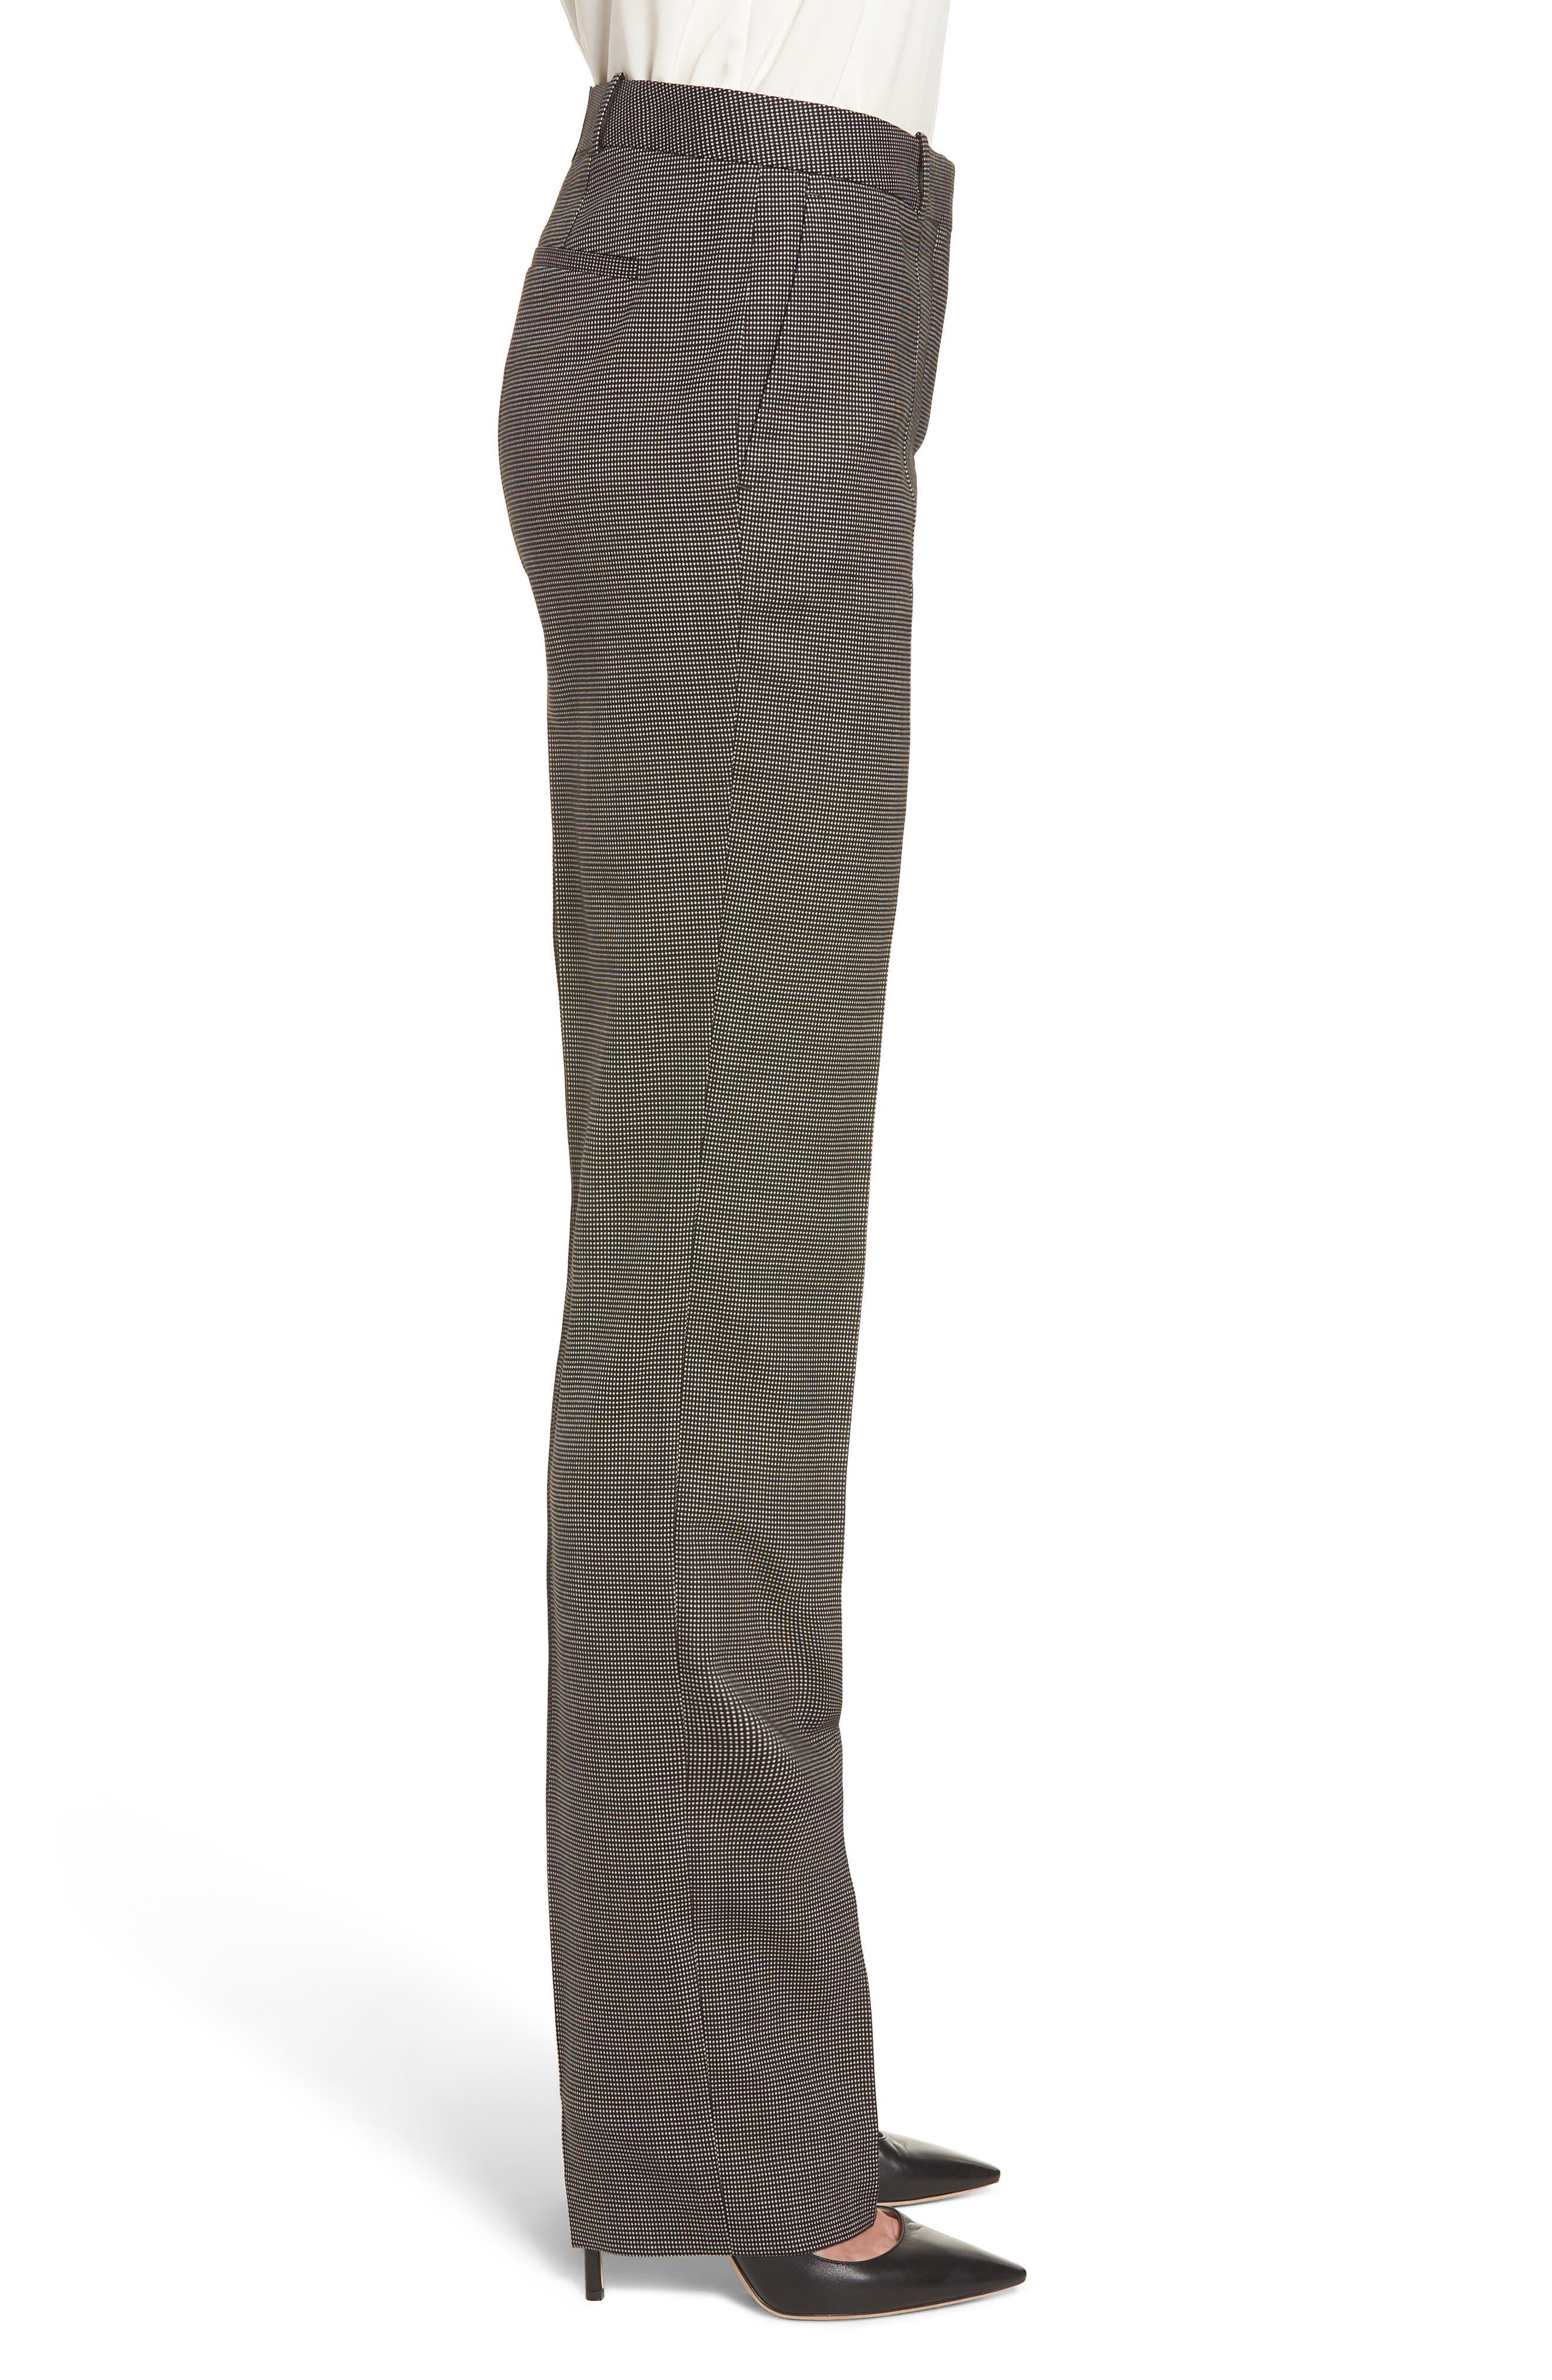 Tamea Minidessin Pants,                             Alternate thumbnail 3, color,                             071